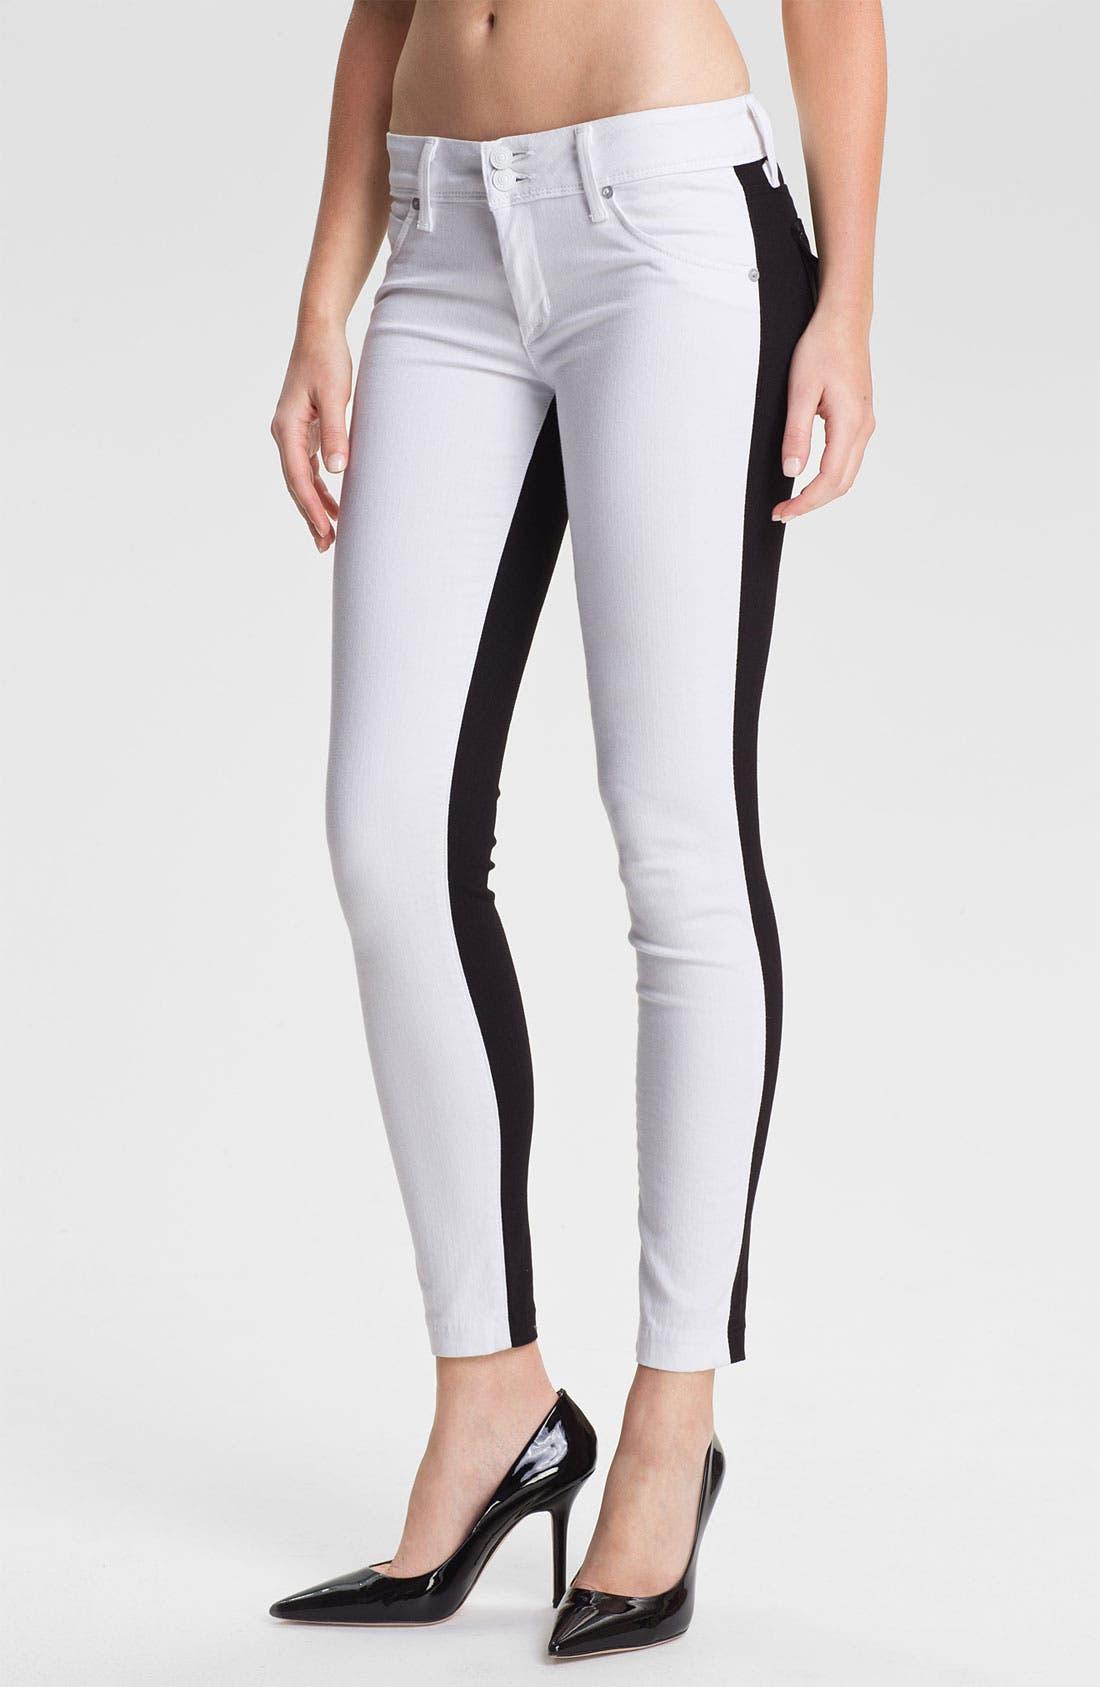 Alternate Image 1 Selected - Hudson Jeans 'Collin' Skinny Stretch Jeans (Vice Versa)